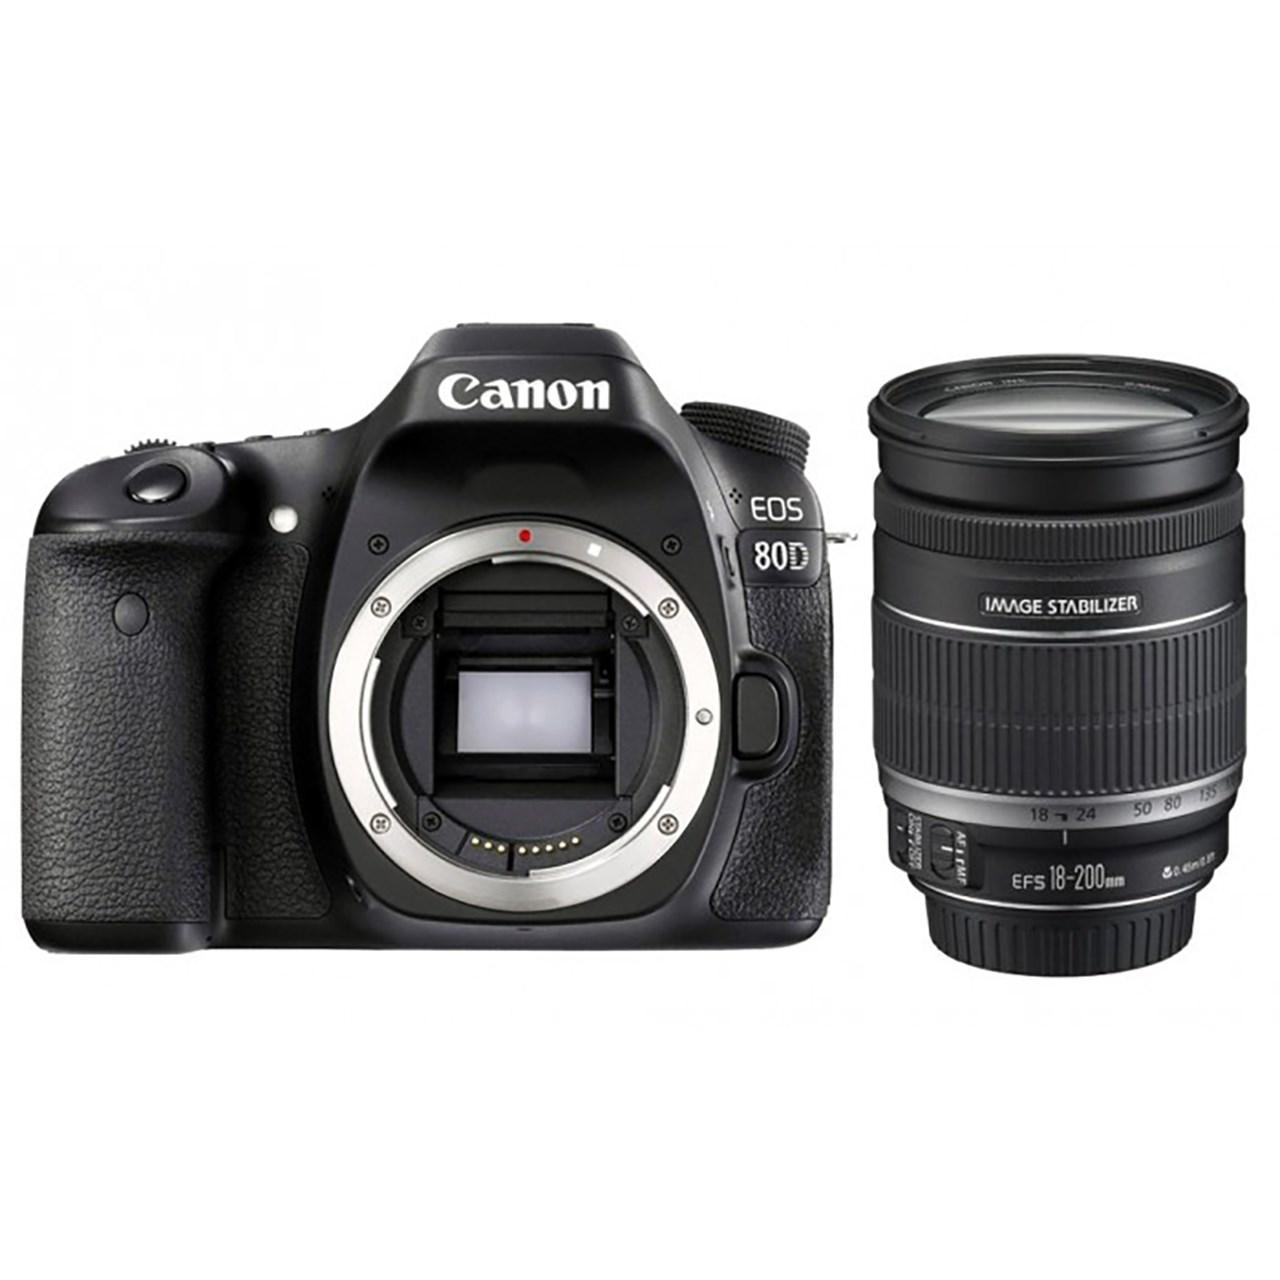 دوربین دیجیتال کانن مدل Canon Eos 80D Digital Camera With 18-200mm Lens